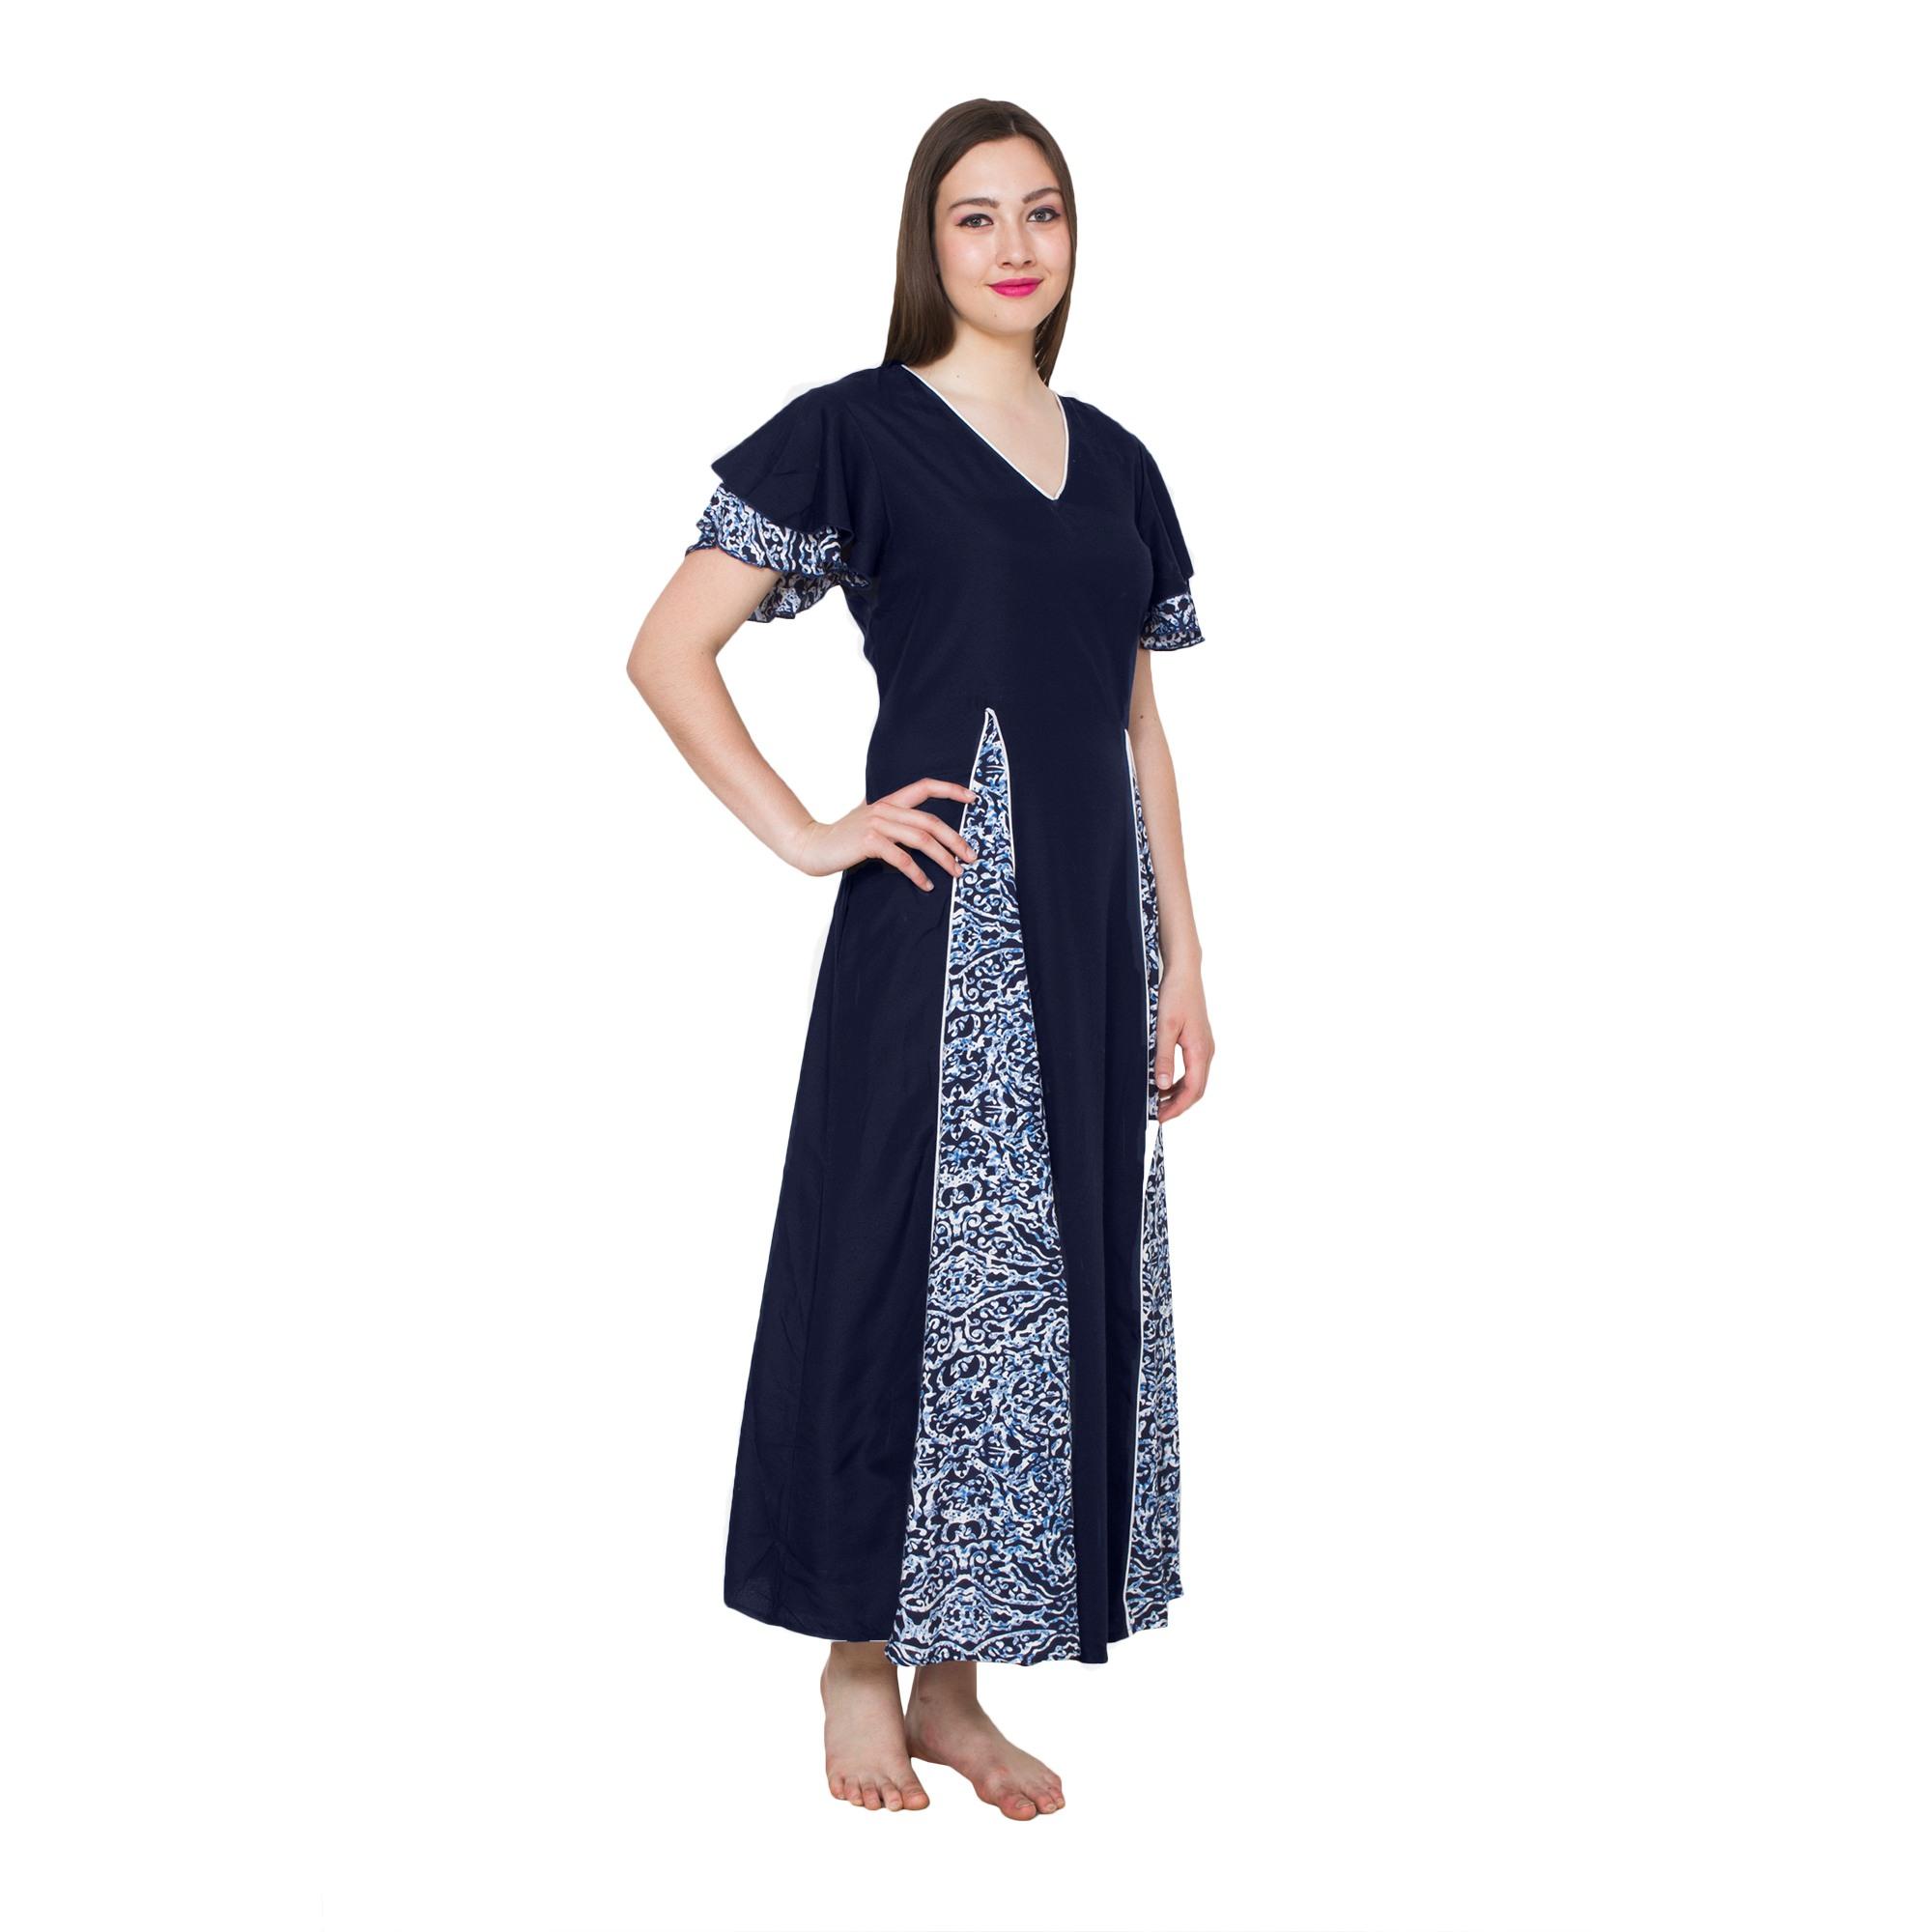 Princess Line Smock Peplum Nighty Gown in Dark Blue